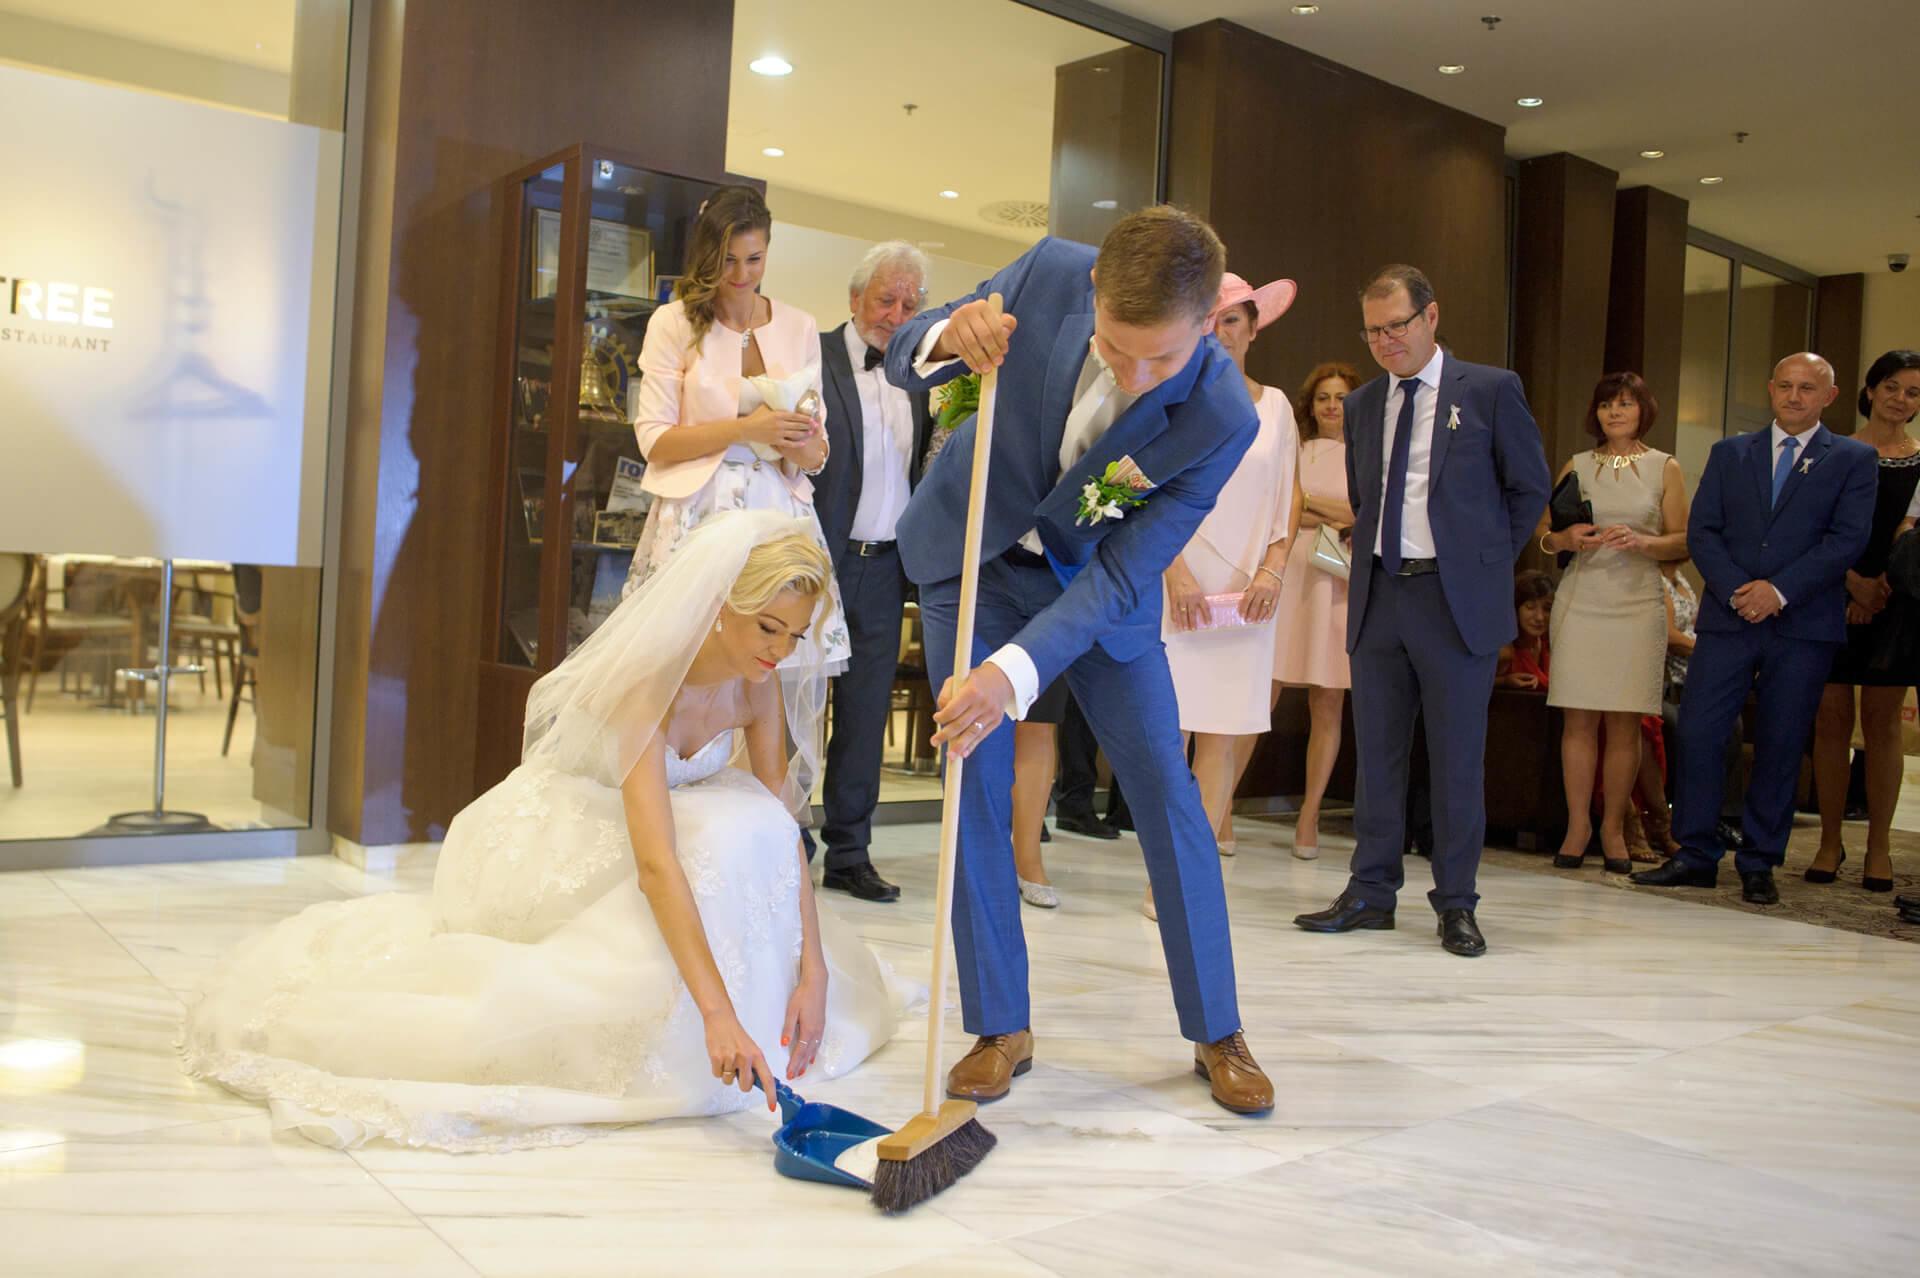 svadba svadobny zabava hostina profesionalne fotenie fotograf Peter Norulak Kosice__16